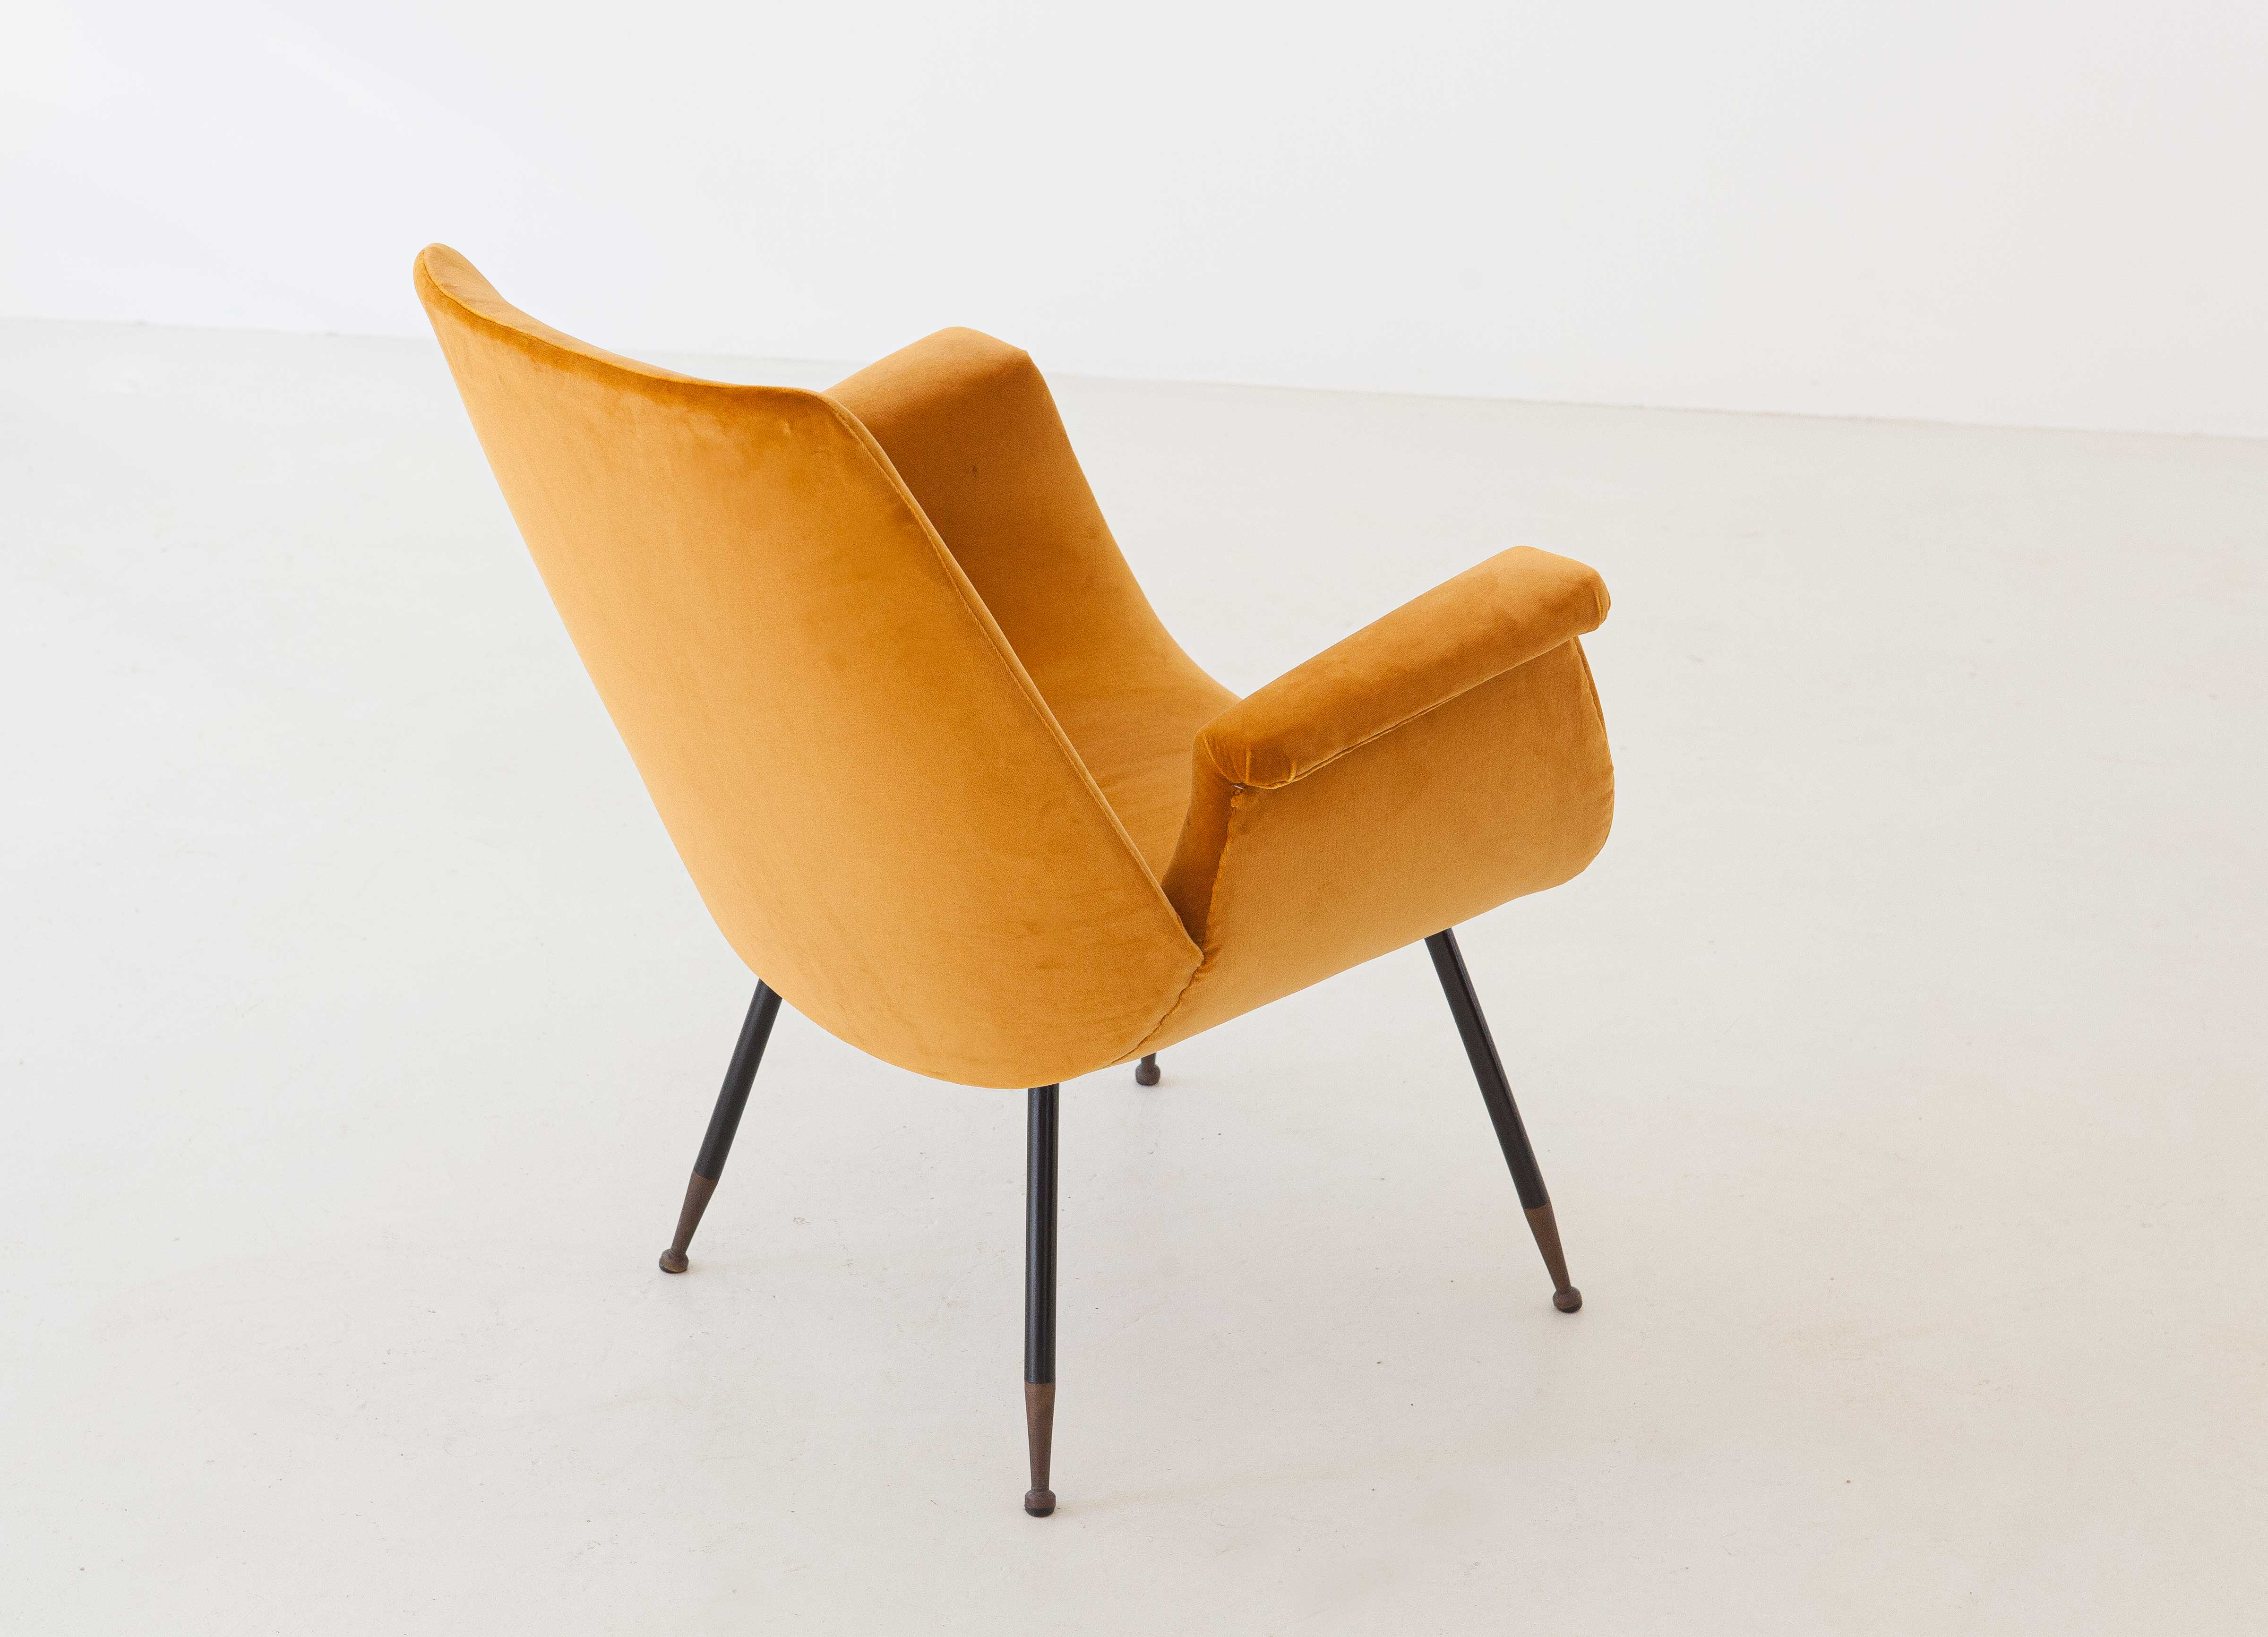 1950s-gastone-rinaldi-yellow-velvet-lounge-armchair-2-se316